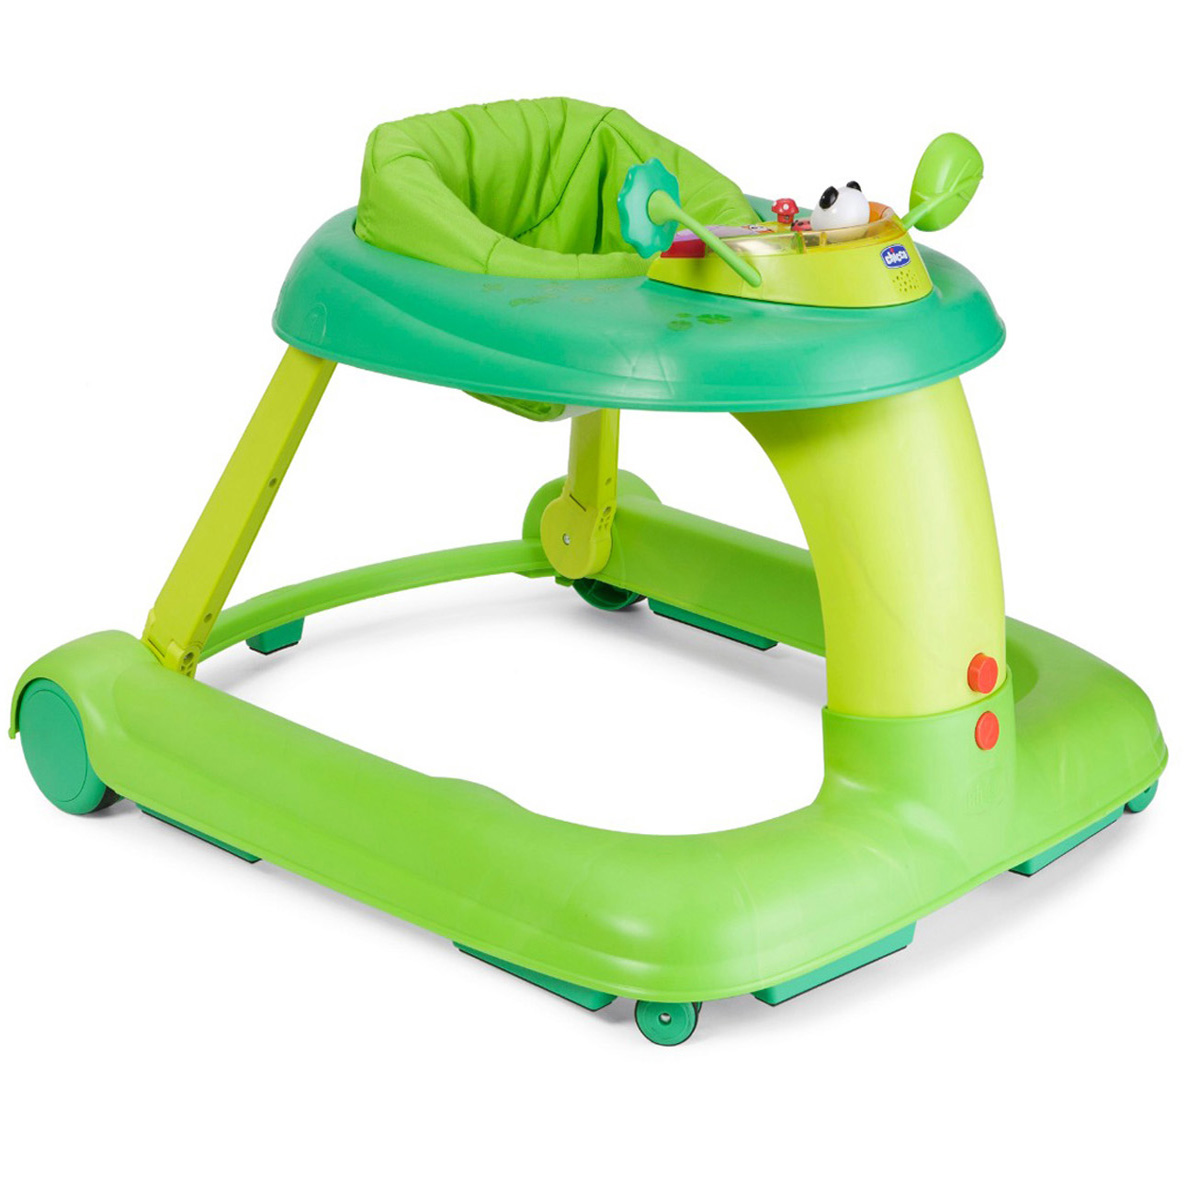 Каталка-ходунки Chicco 123 Baby Walker, цвет: зеленый